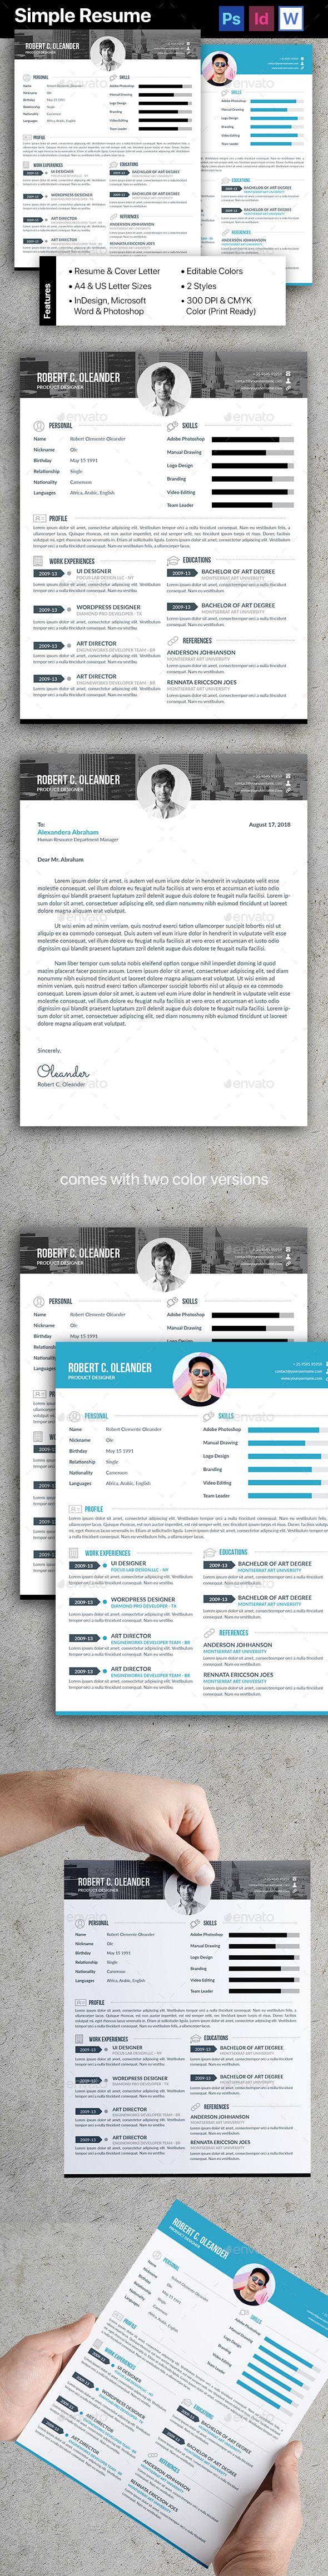 Resumecv resume cv latest adobe photoshop and cv template resumecv yelopaper Choice Image